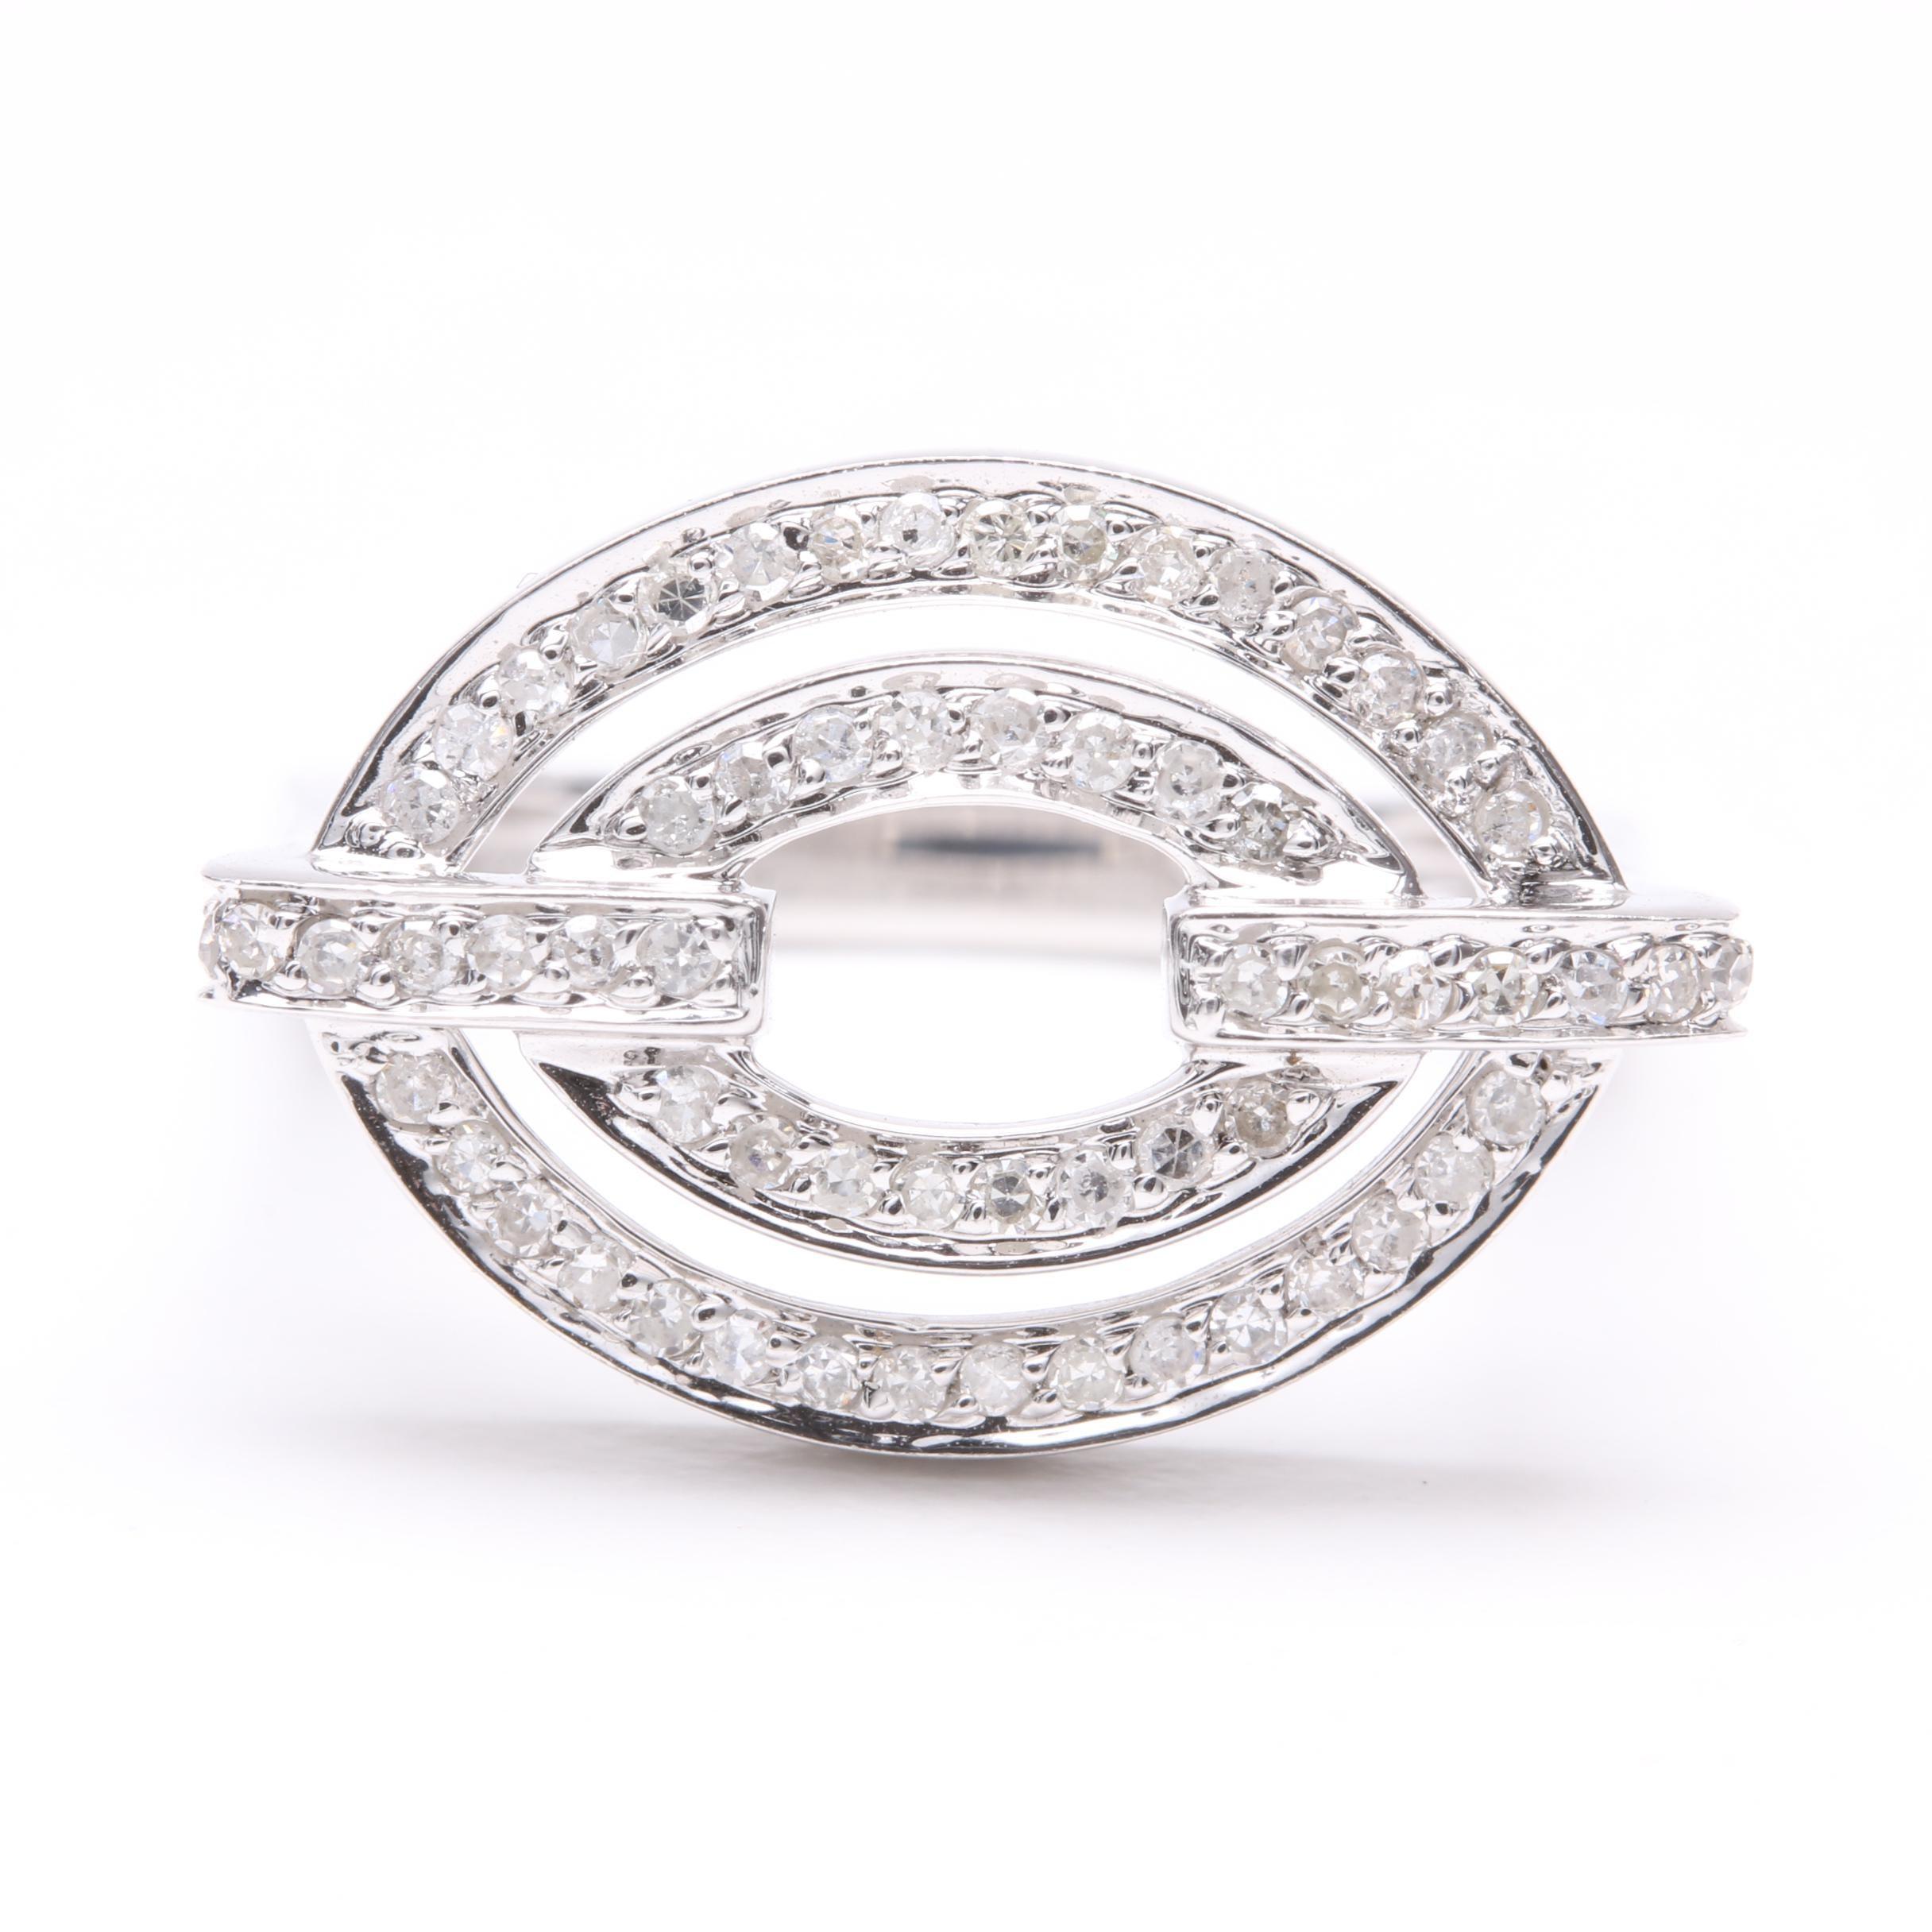 14K White Gold Diamond Squared Shank Ring